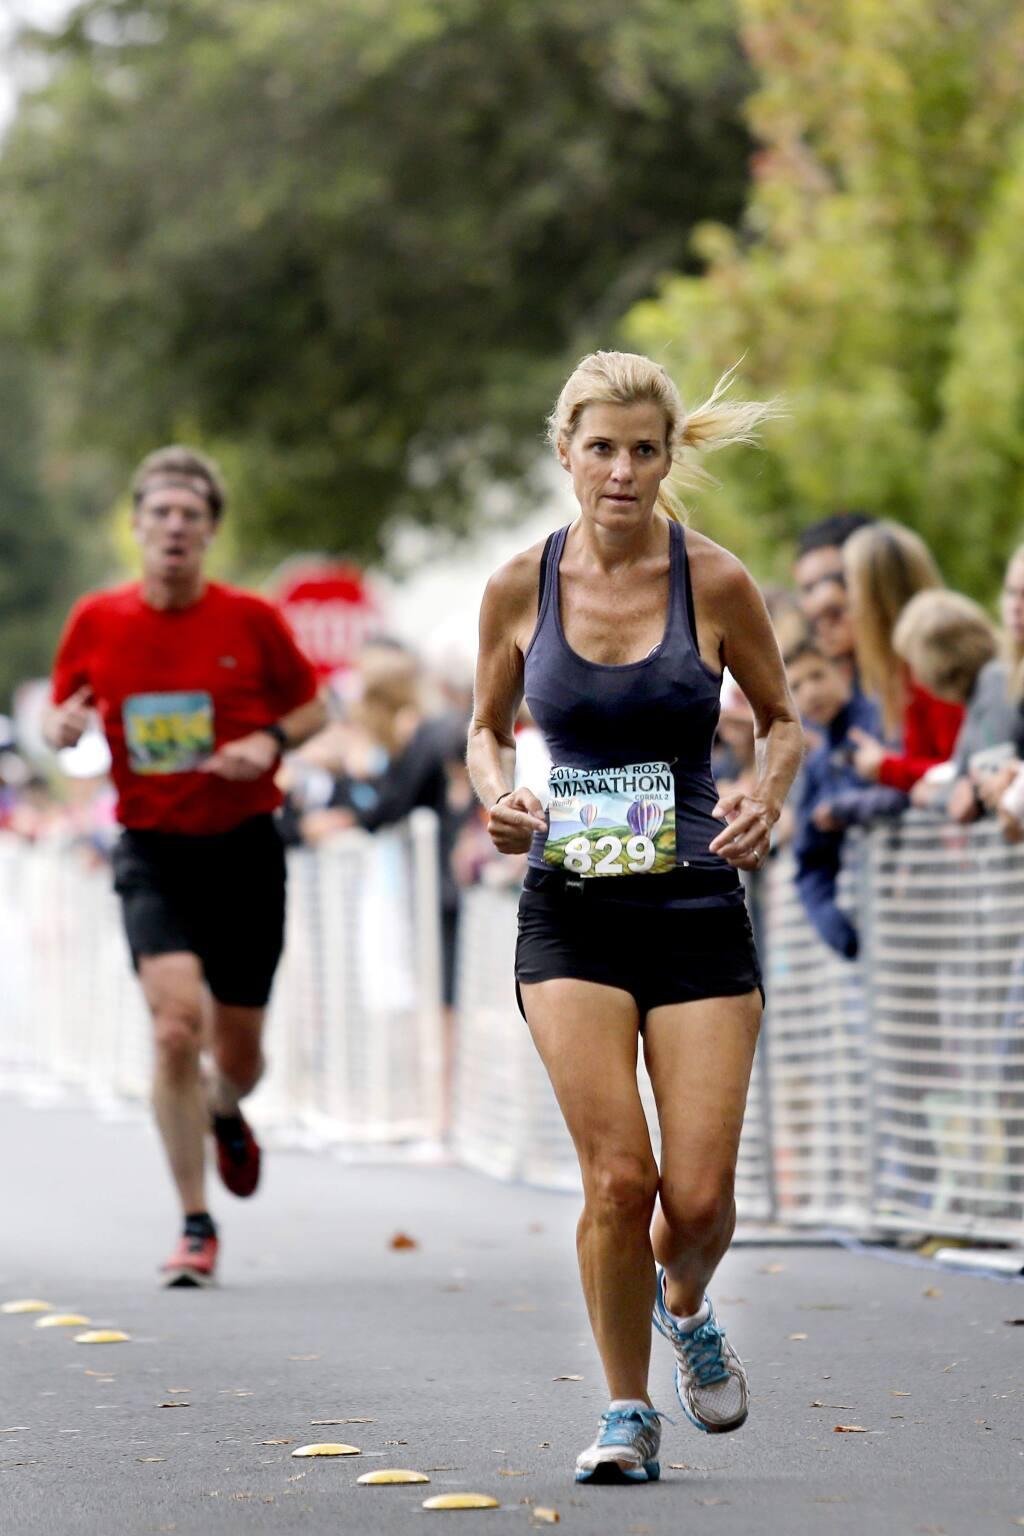 Wendy Jennings approaches the finish line of the Santa Rosa Marathon in Santa Rosa, on Sunday, August 23, 2015. (BETH SCHLANKER/ The Press Democrat)